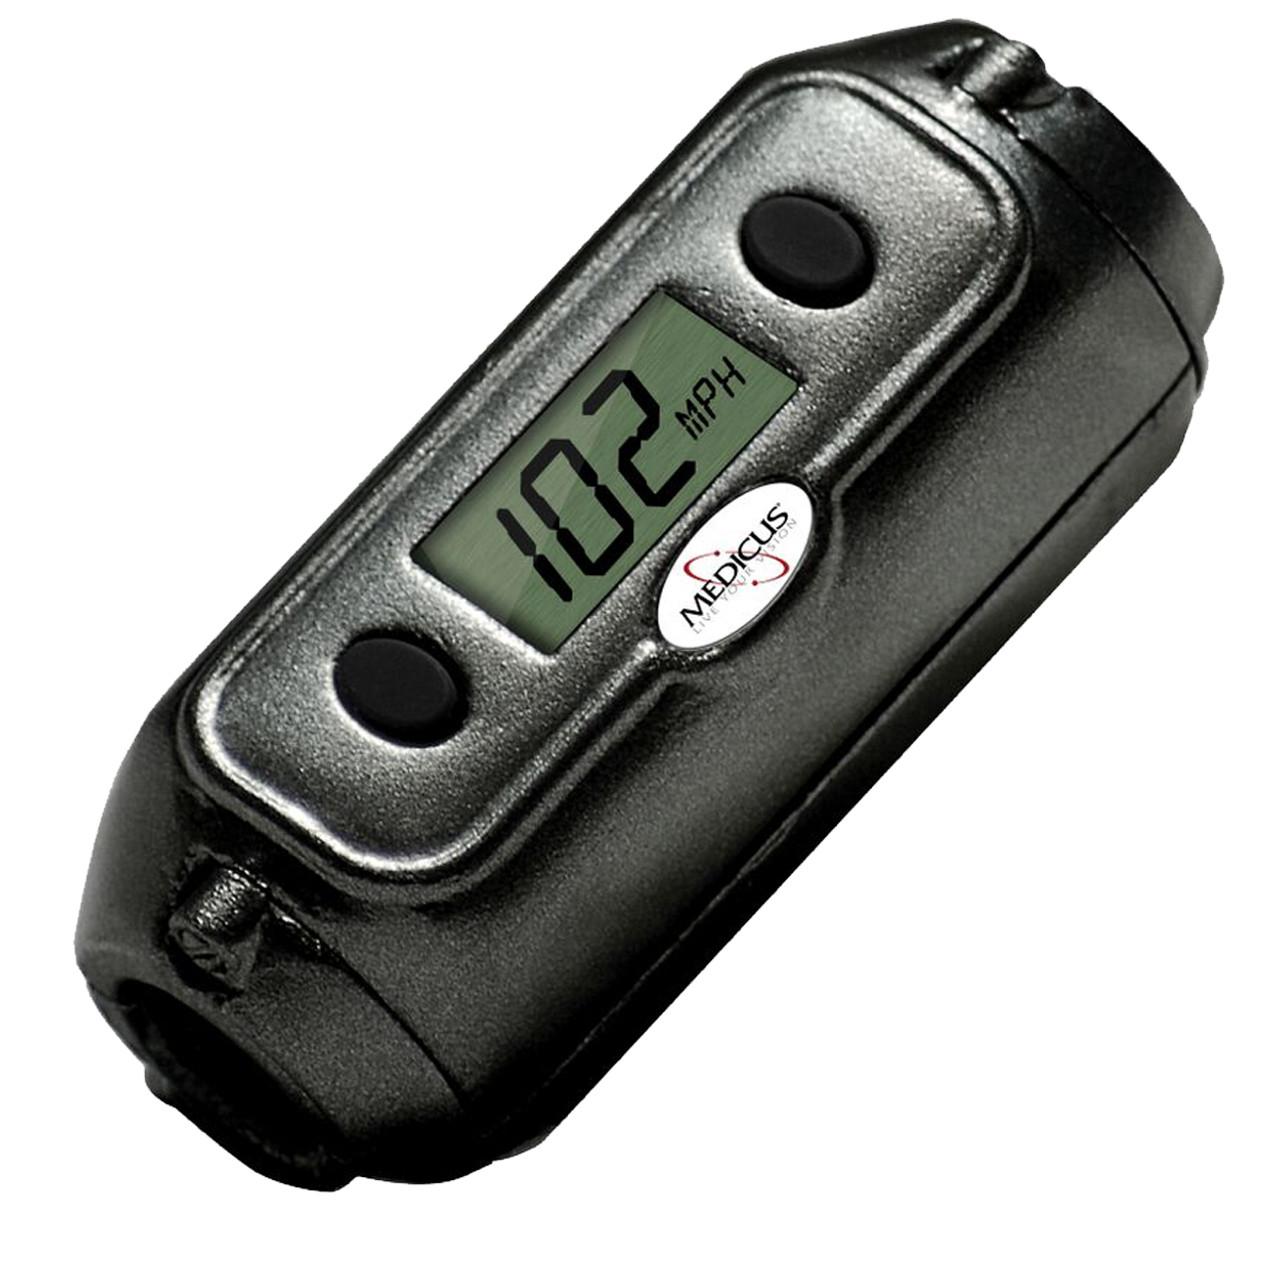 medicus power meter swing speed monitor golfetail com rh golfetail com Speed Meter Medicus Power Meter Manual